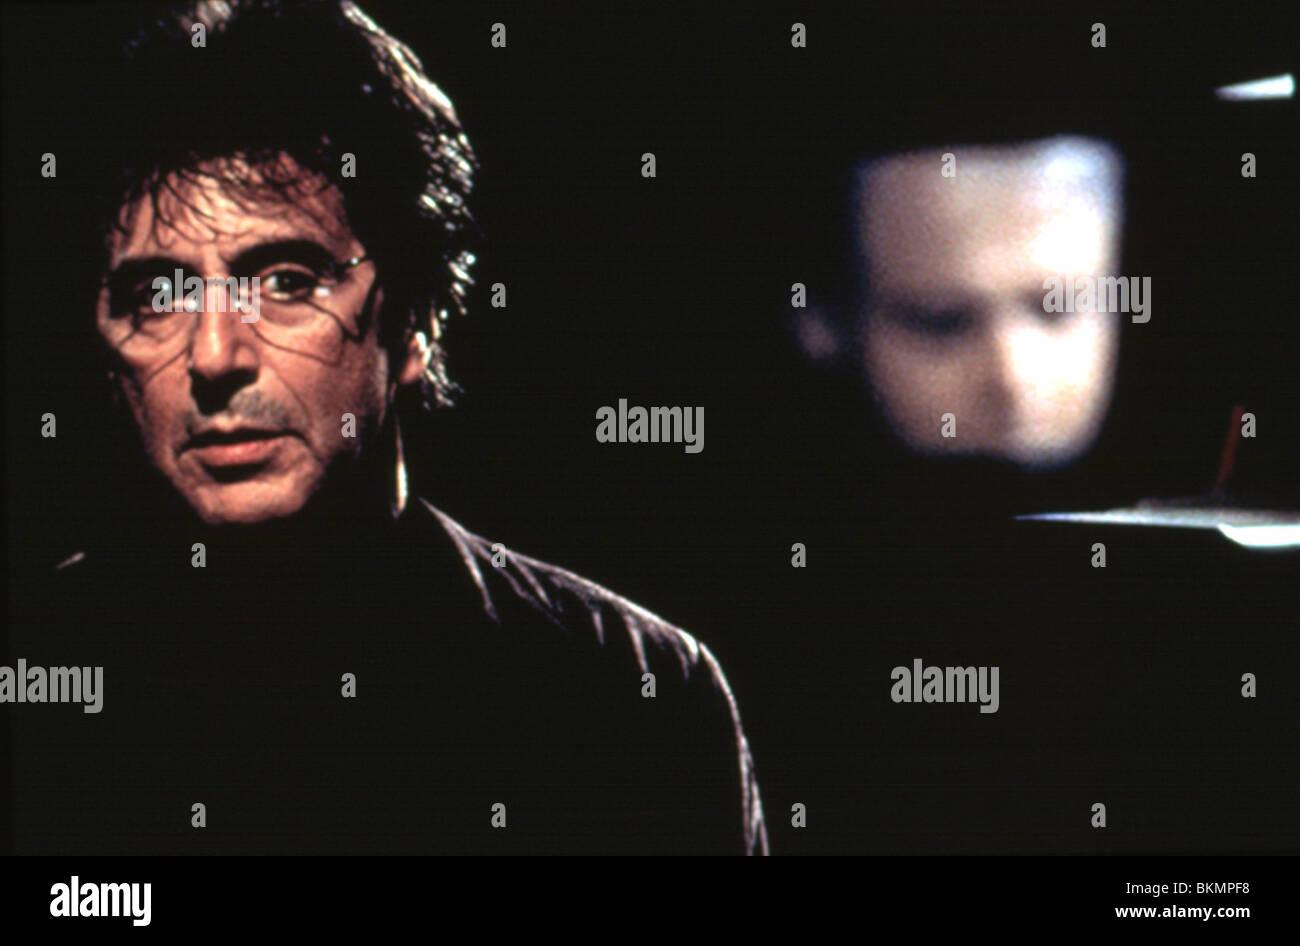 THE INSIDER -1999 AL PACINO - Stock Image